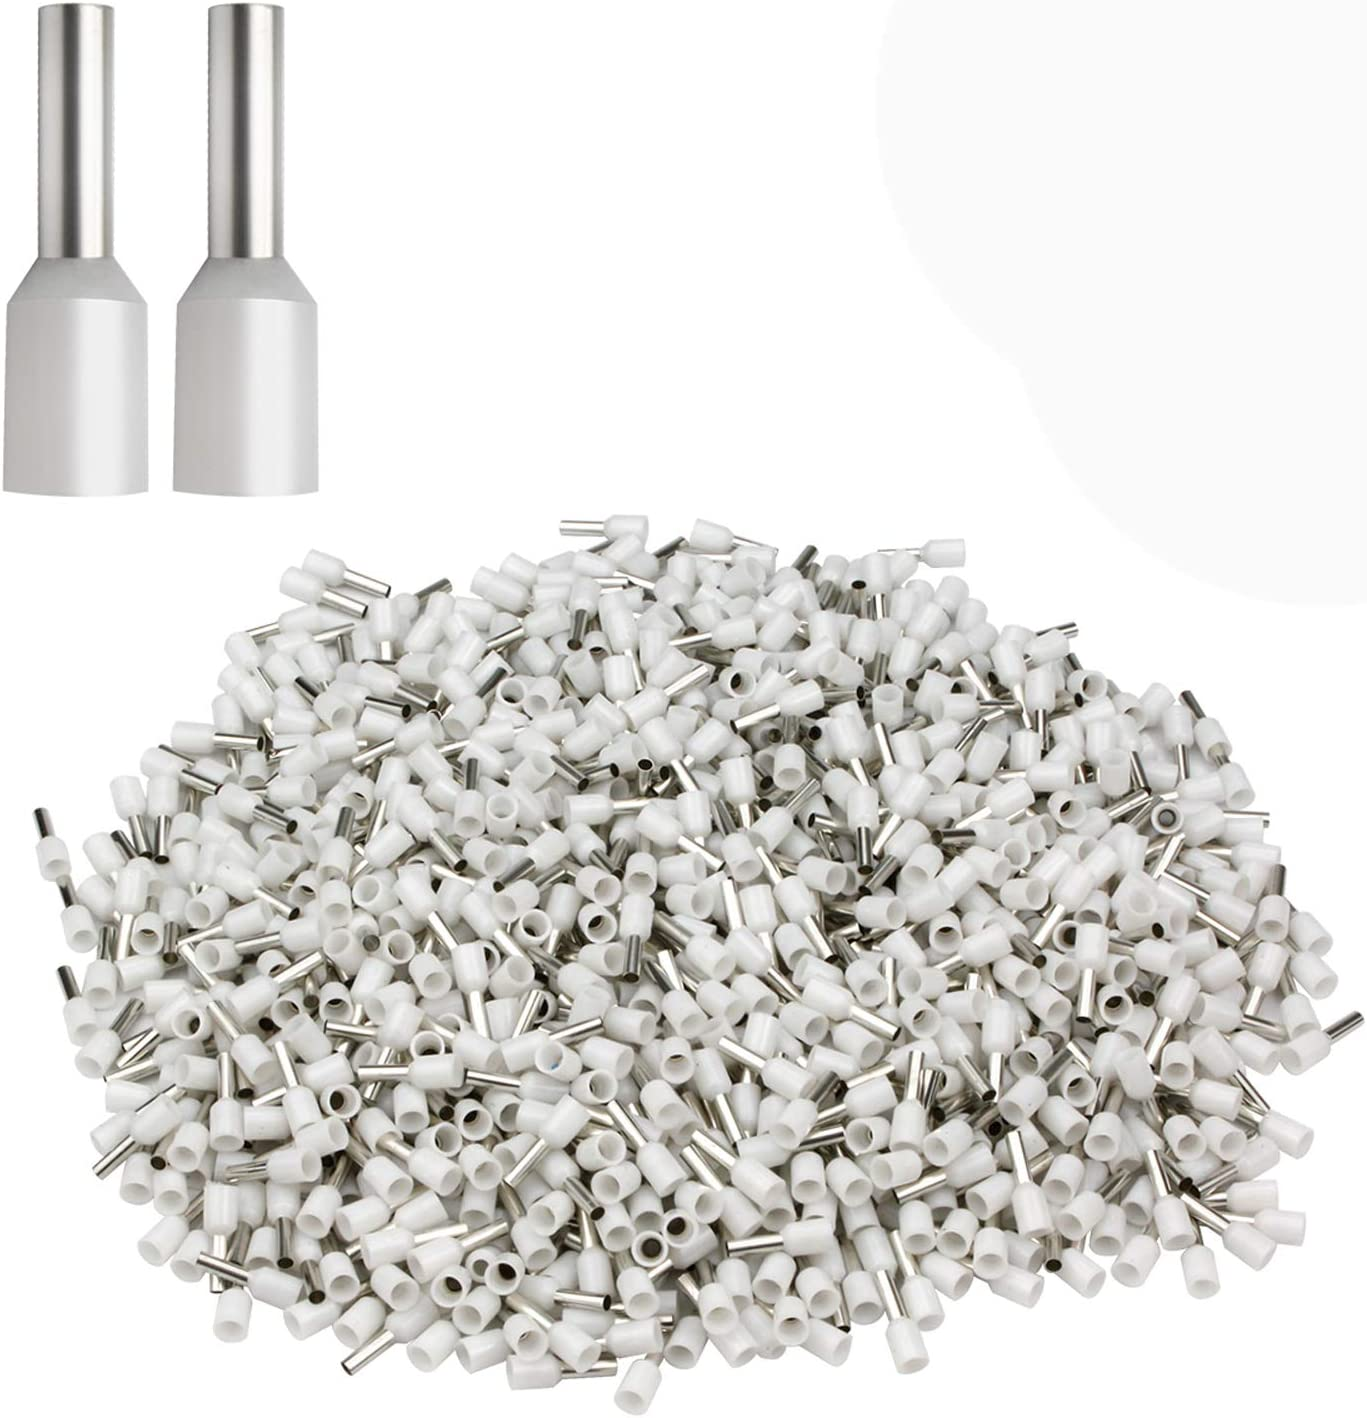 XHF Seasonal Wrap Introduction 1000 PCS AWG 20 Ferrule Crimper Insulated Te Crimp Save money Pin Plier